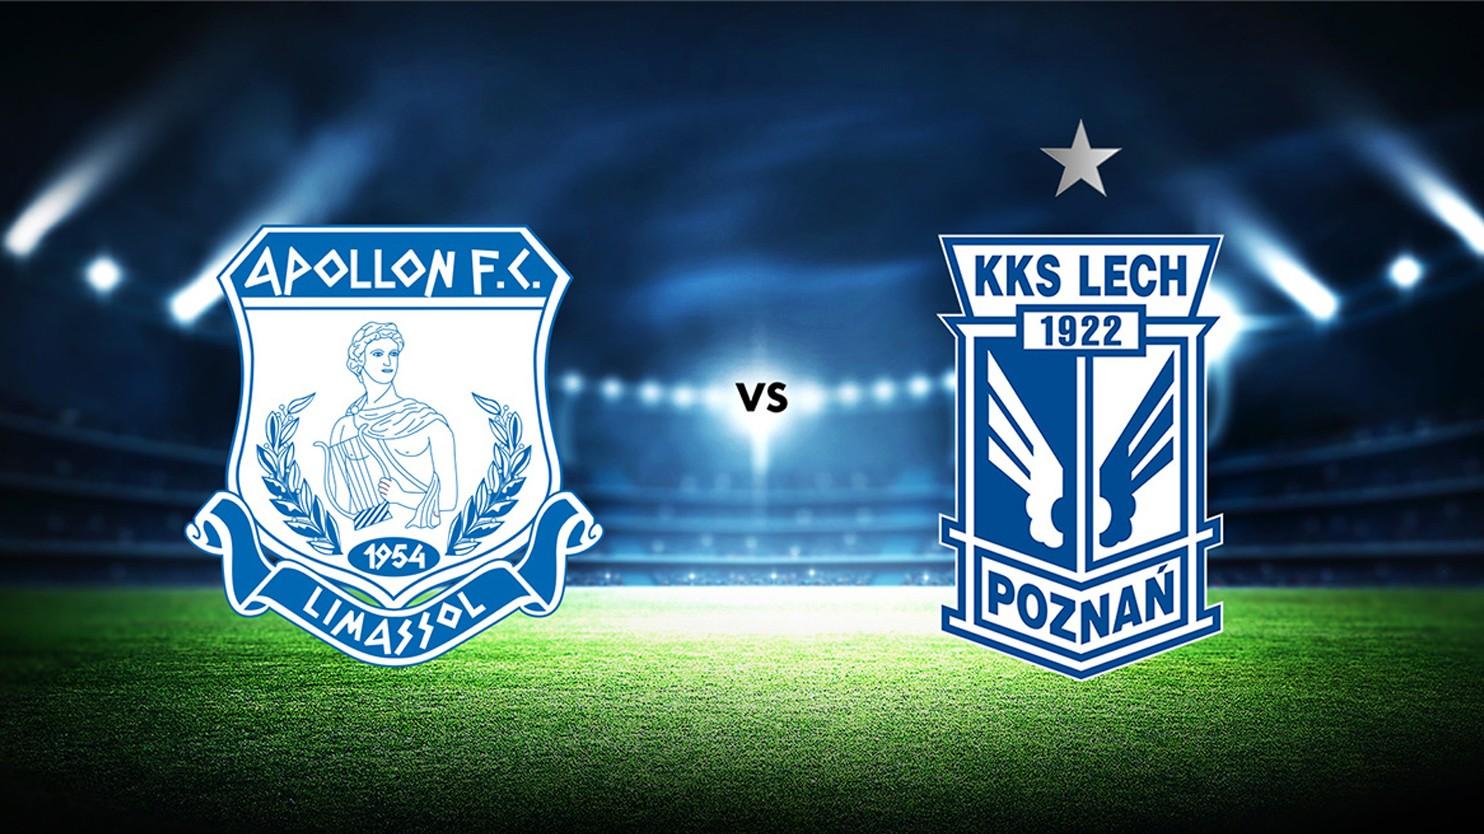 Oglądaj mecz Apollon Limassol - Lech Poznań w Polsat Sport